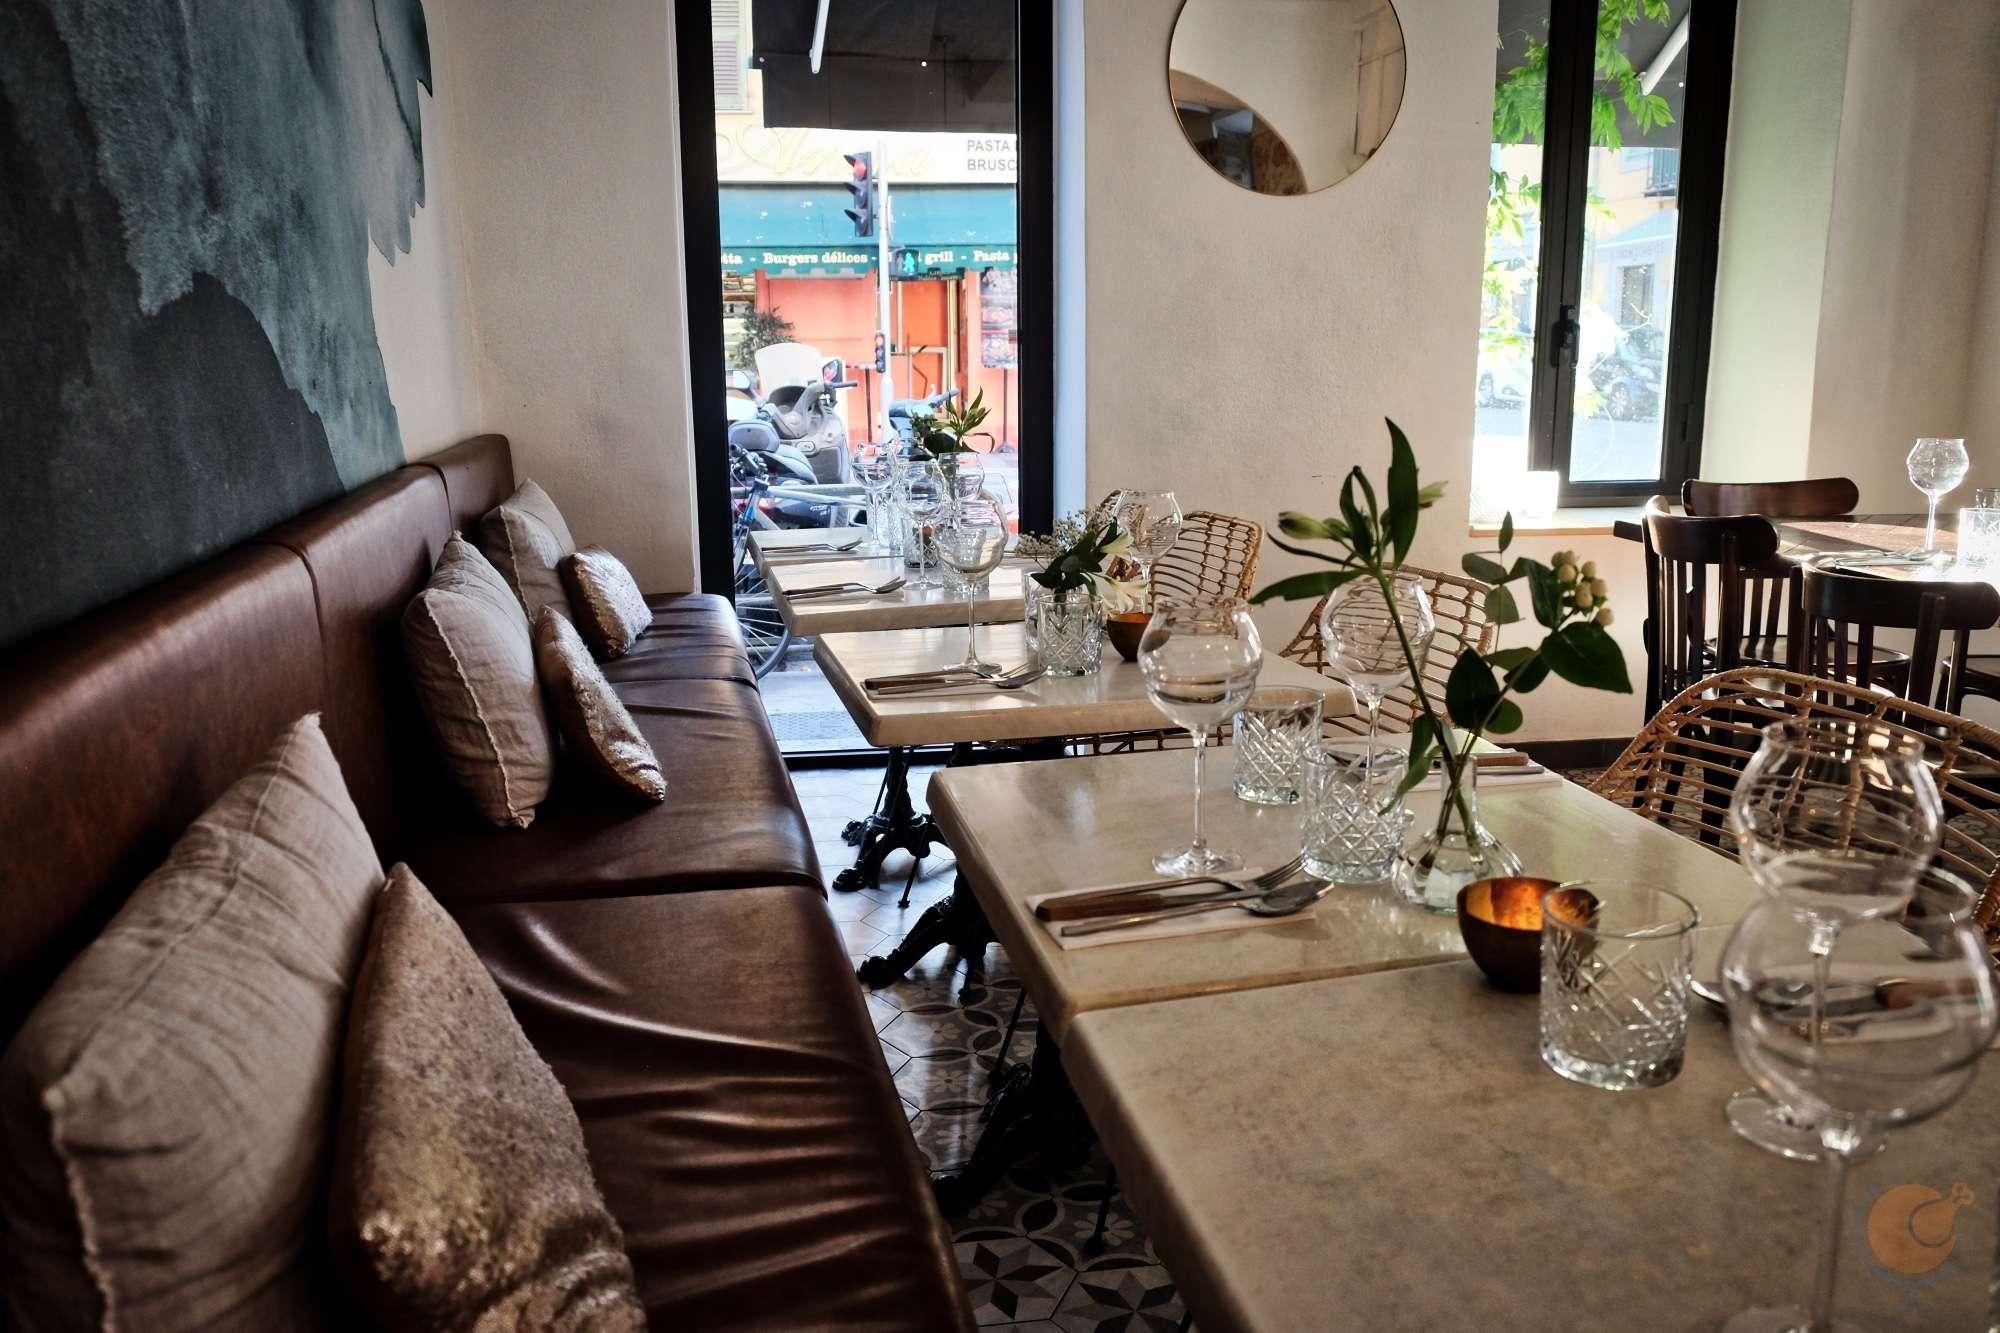 dscf1332_les_agitateurs_restaurant_france_nice_nizza_vilagevo_jokuti_andras_l_w.jpg